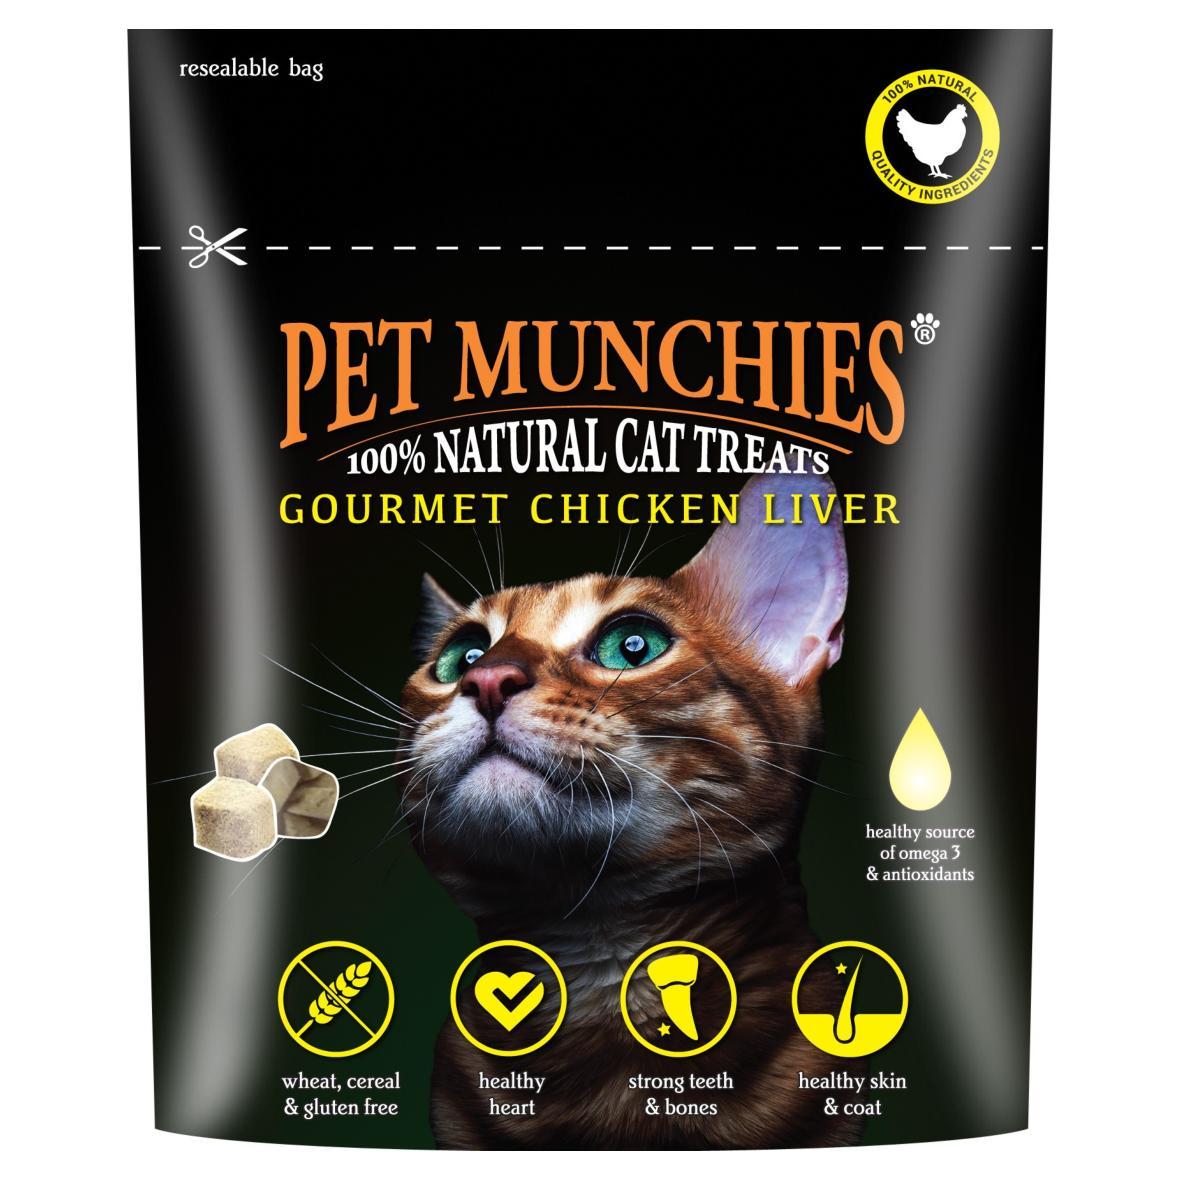 CLEARANCE Pet Munchies Cat Treats Chicken Liver 10g